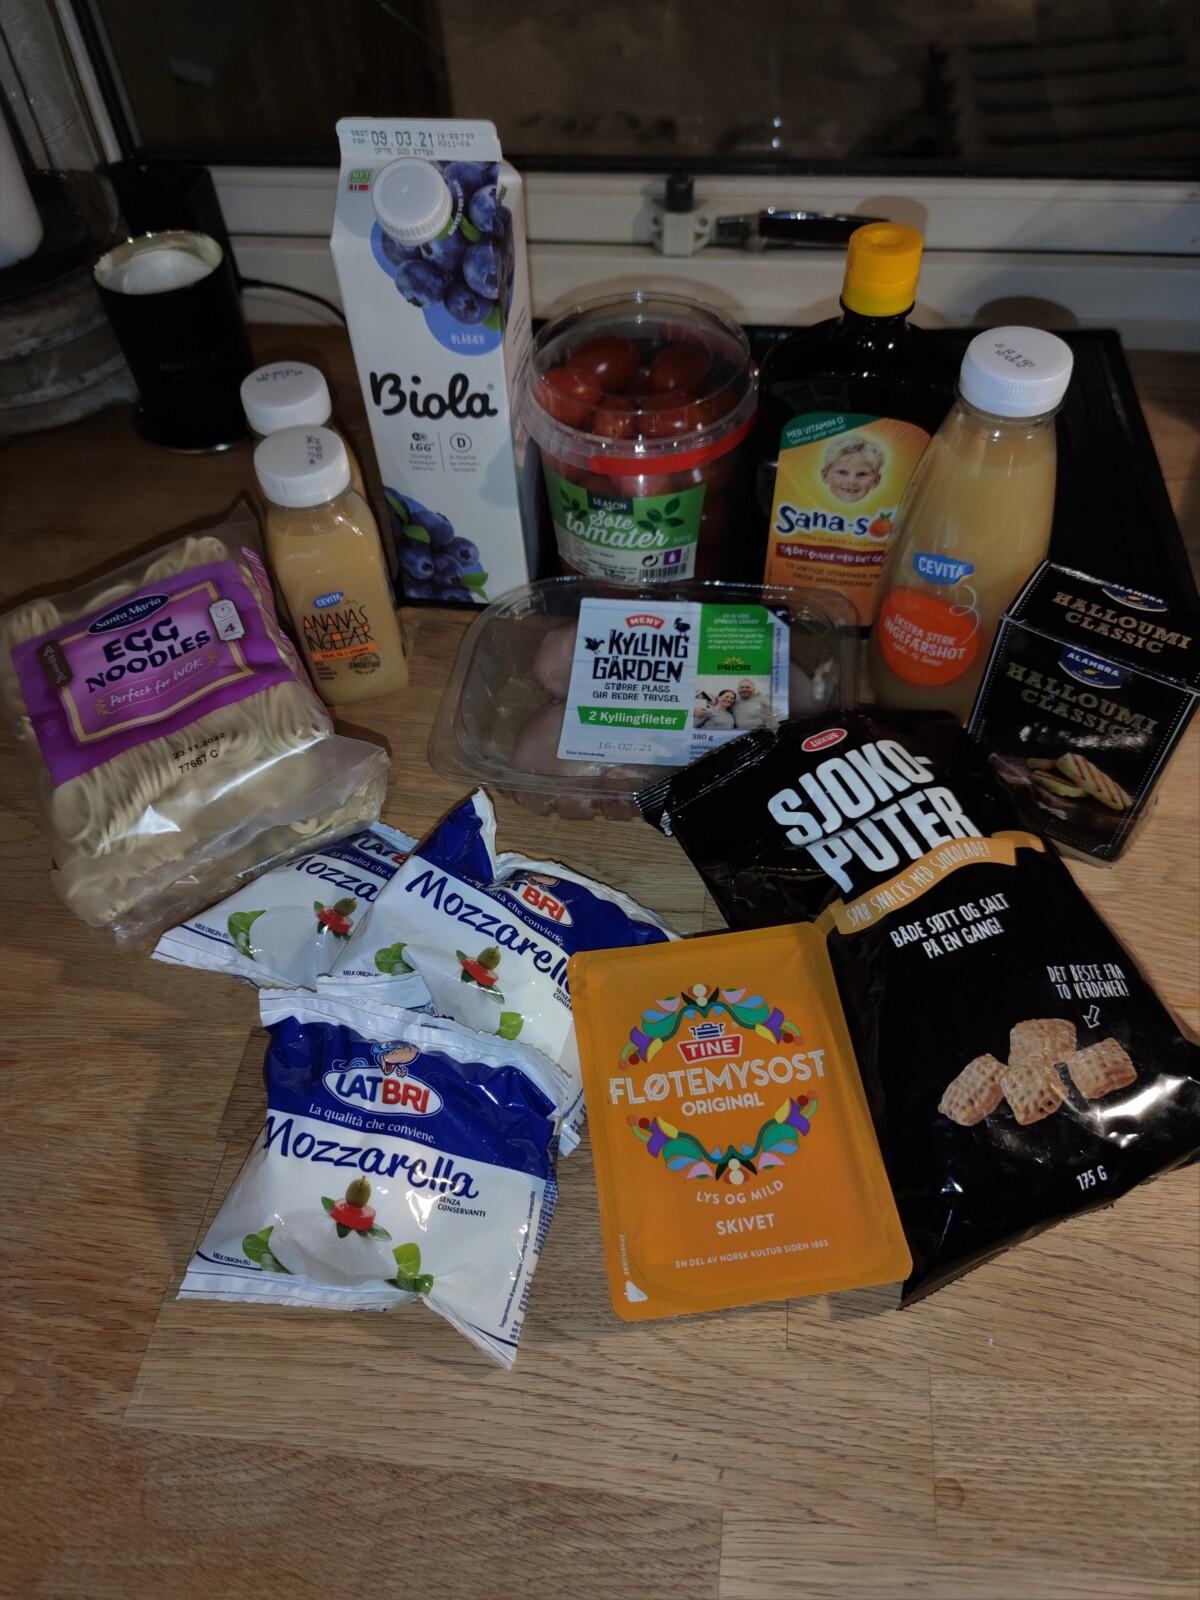 mathandel-mathandling-mathandelen-mat-handel-innkjøp-matinnkjøp-meny-europris-matbutikk-middag-brunost-juice-lux-sjokoputer-tomatmozzarella-eggenudler-halloumi-isalicious-isalicious1-isalicious.blogg.no